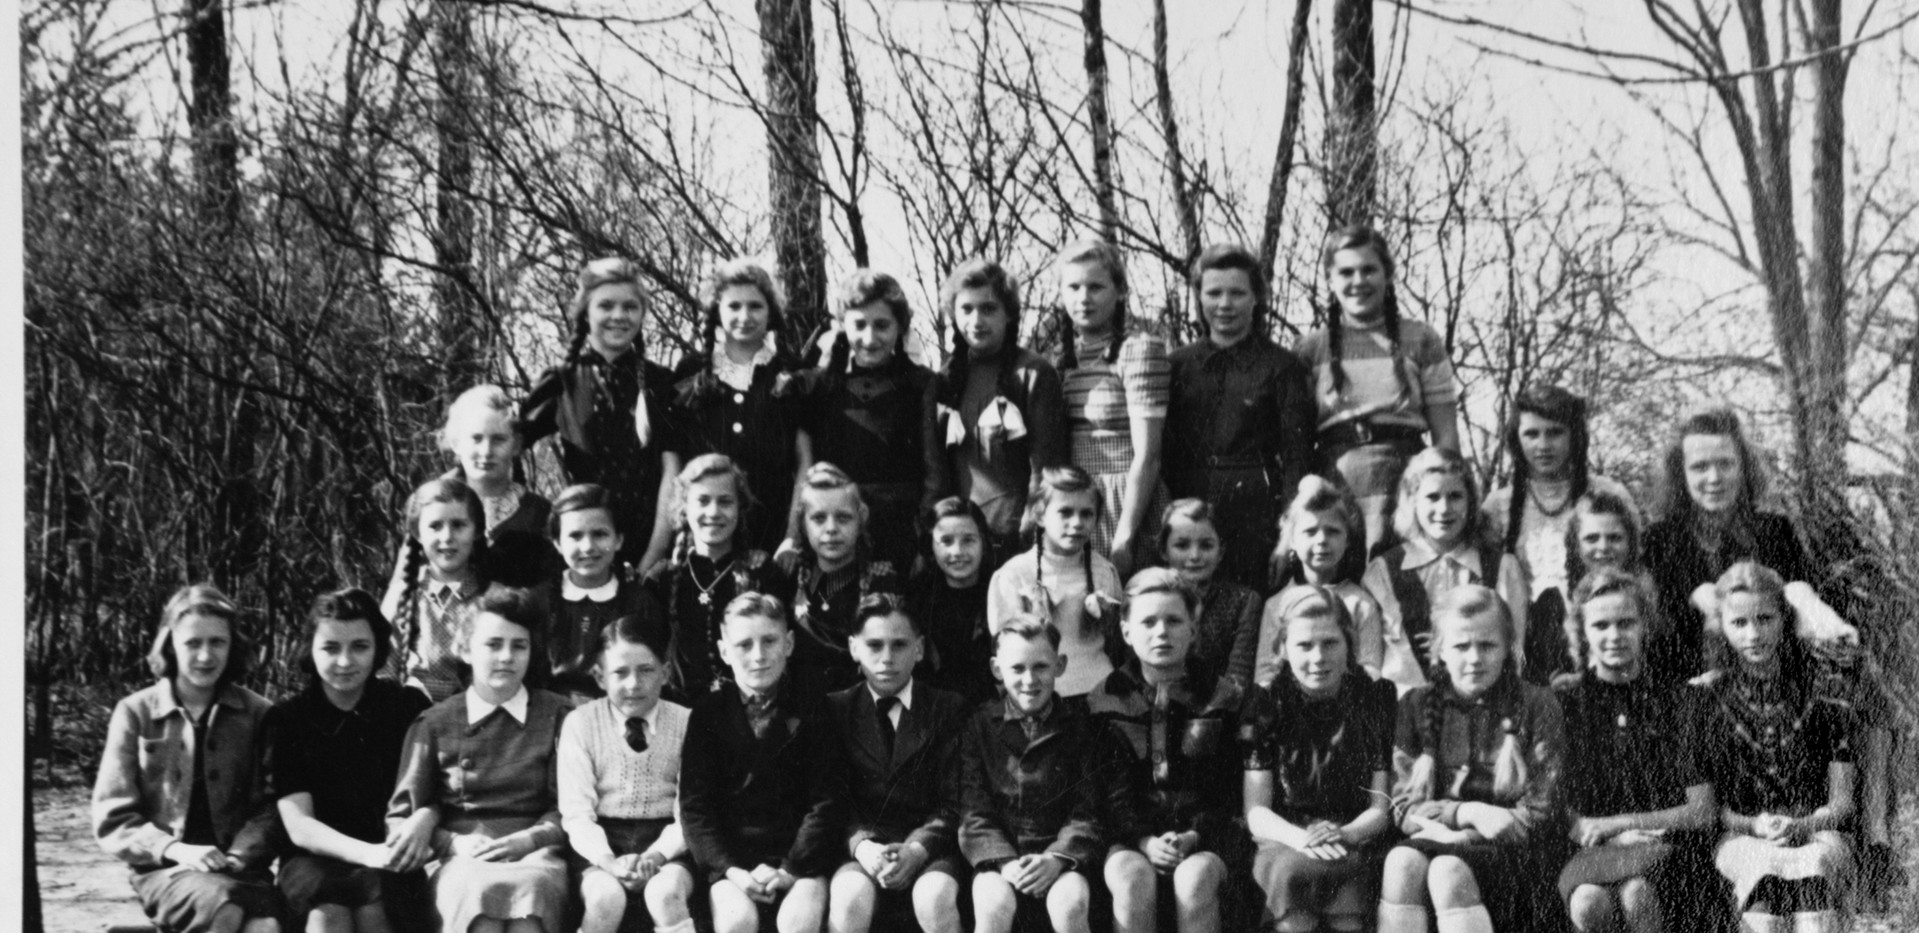 Schulklasse 1950/51